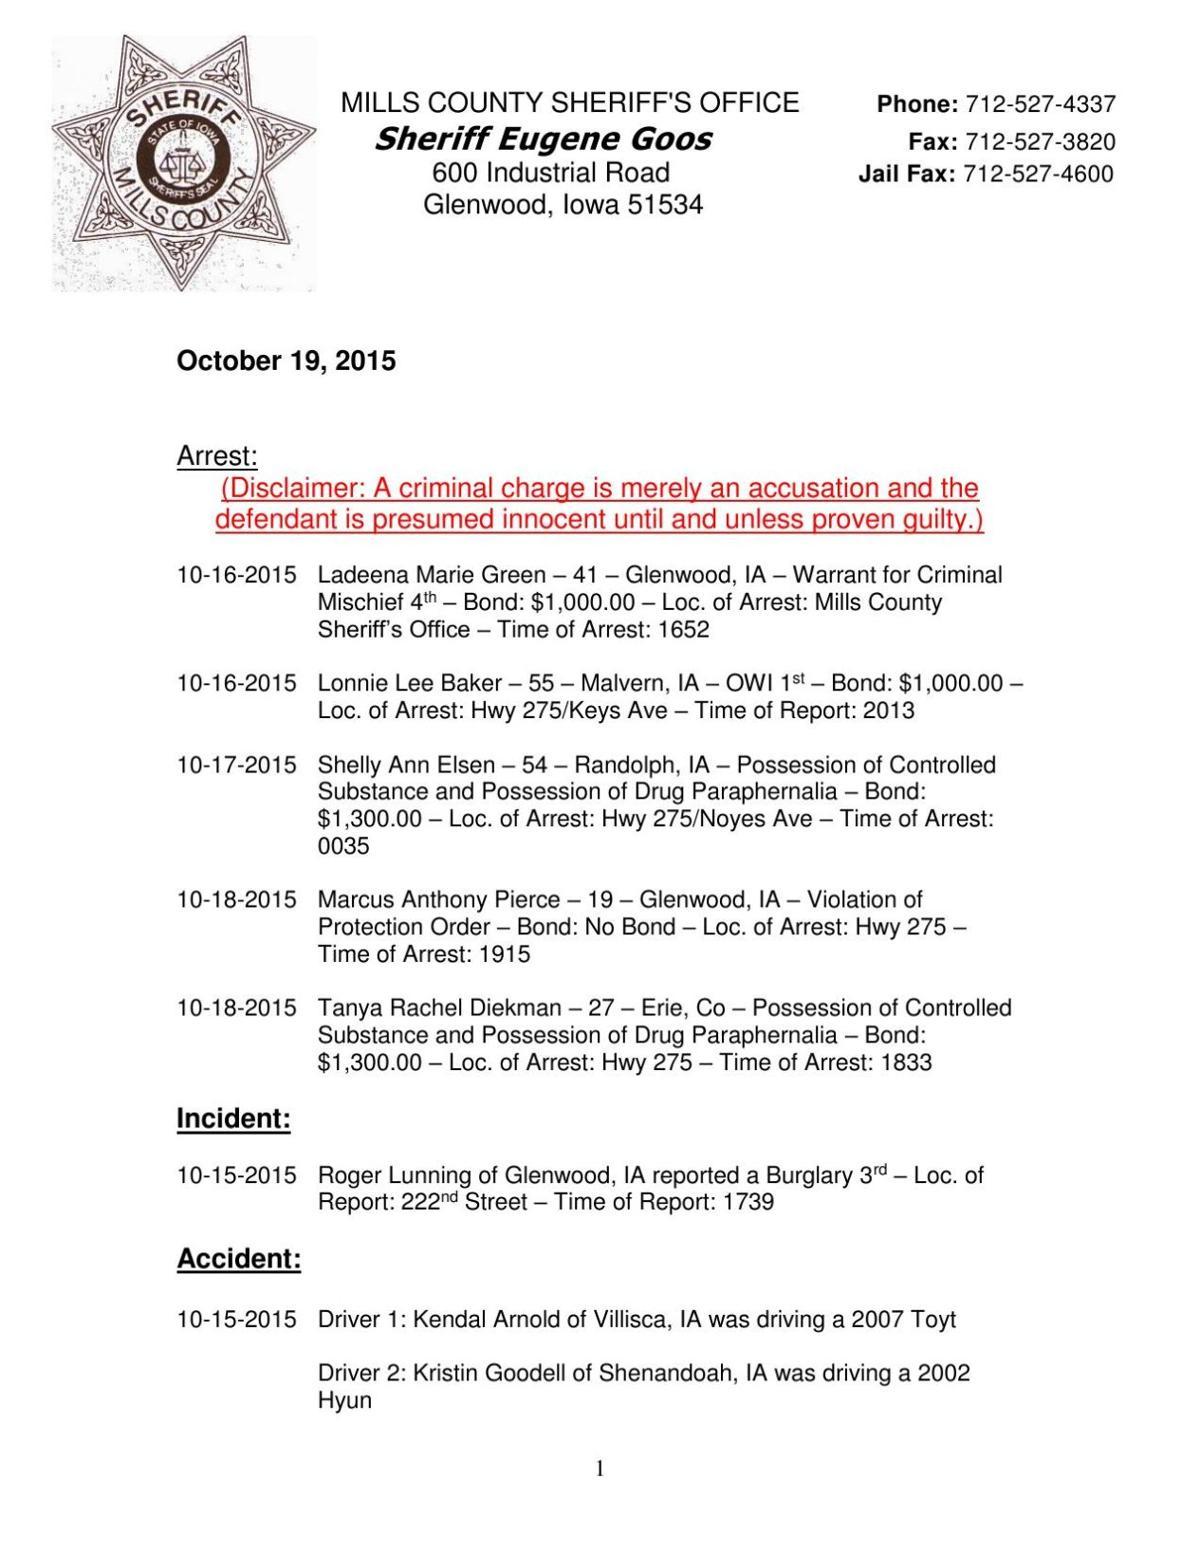 Mills County Sheriff's Report   News   kmaland com